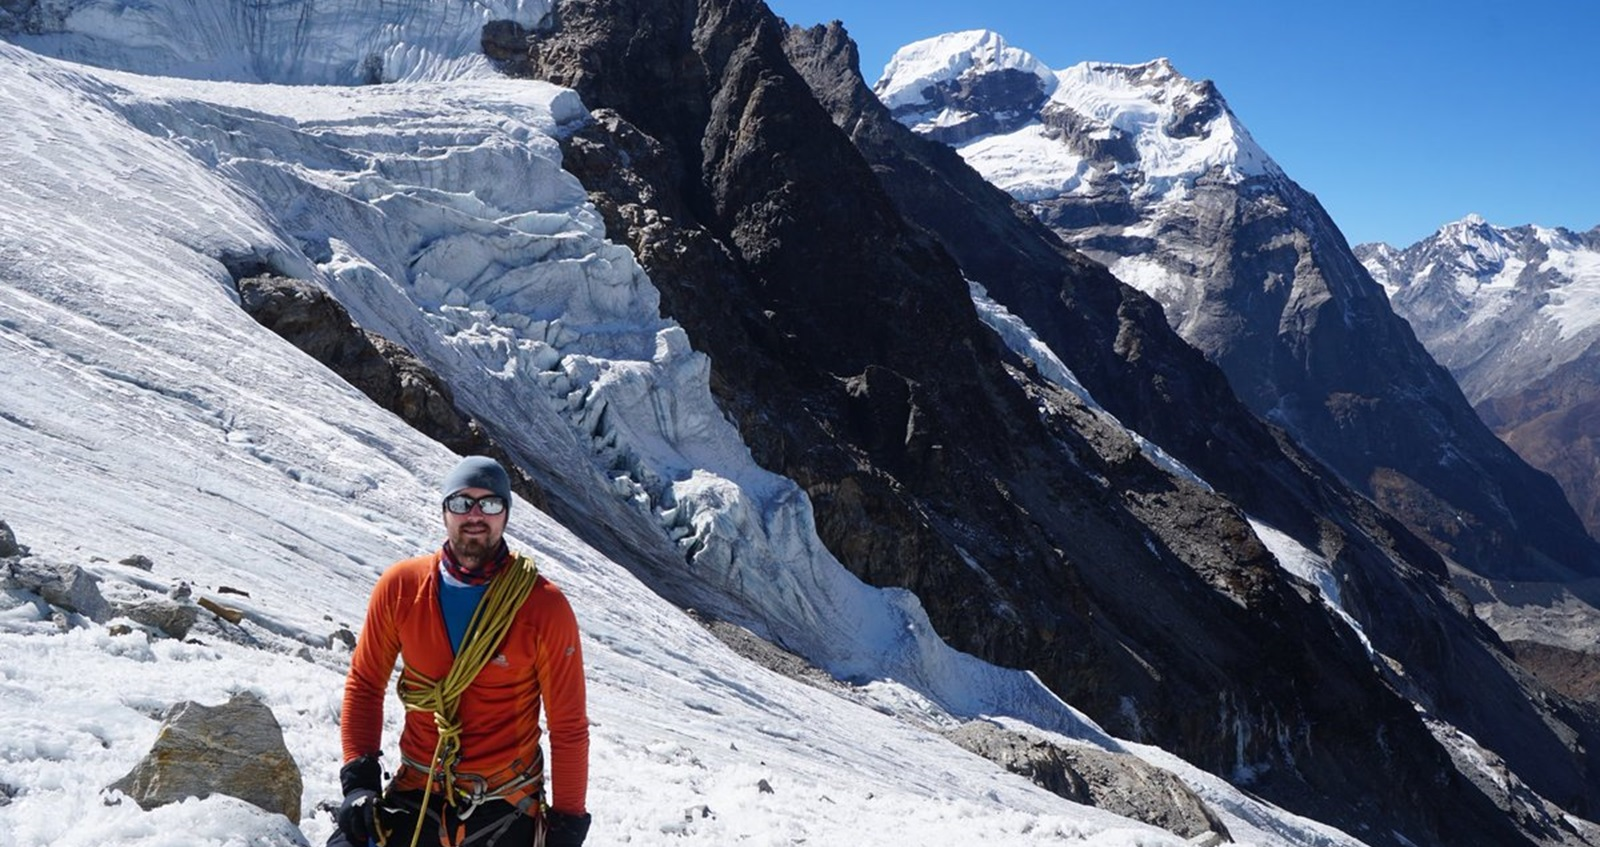 Lyndon Chatting-Walters on Mission Himalaya